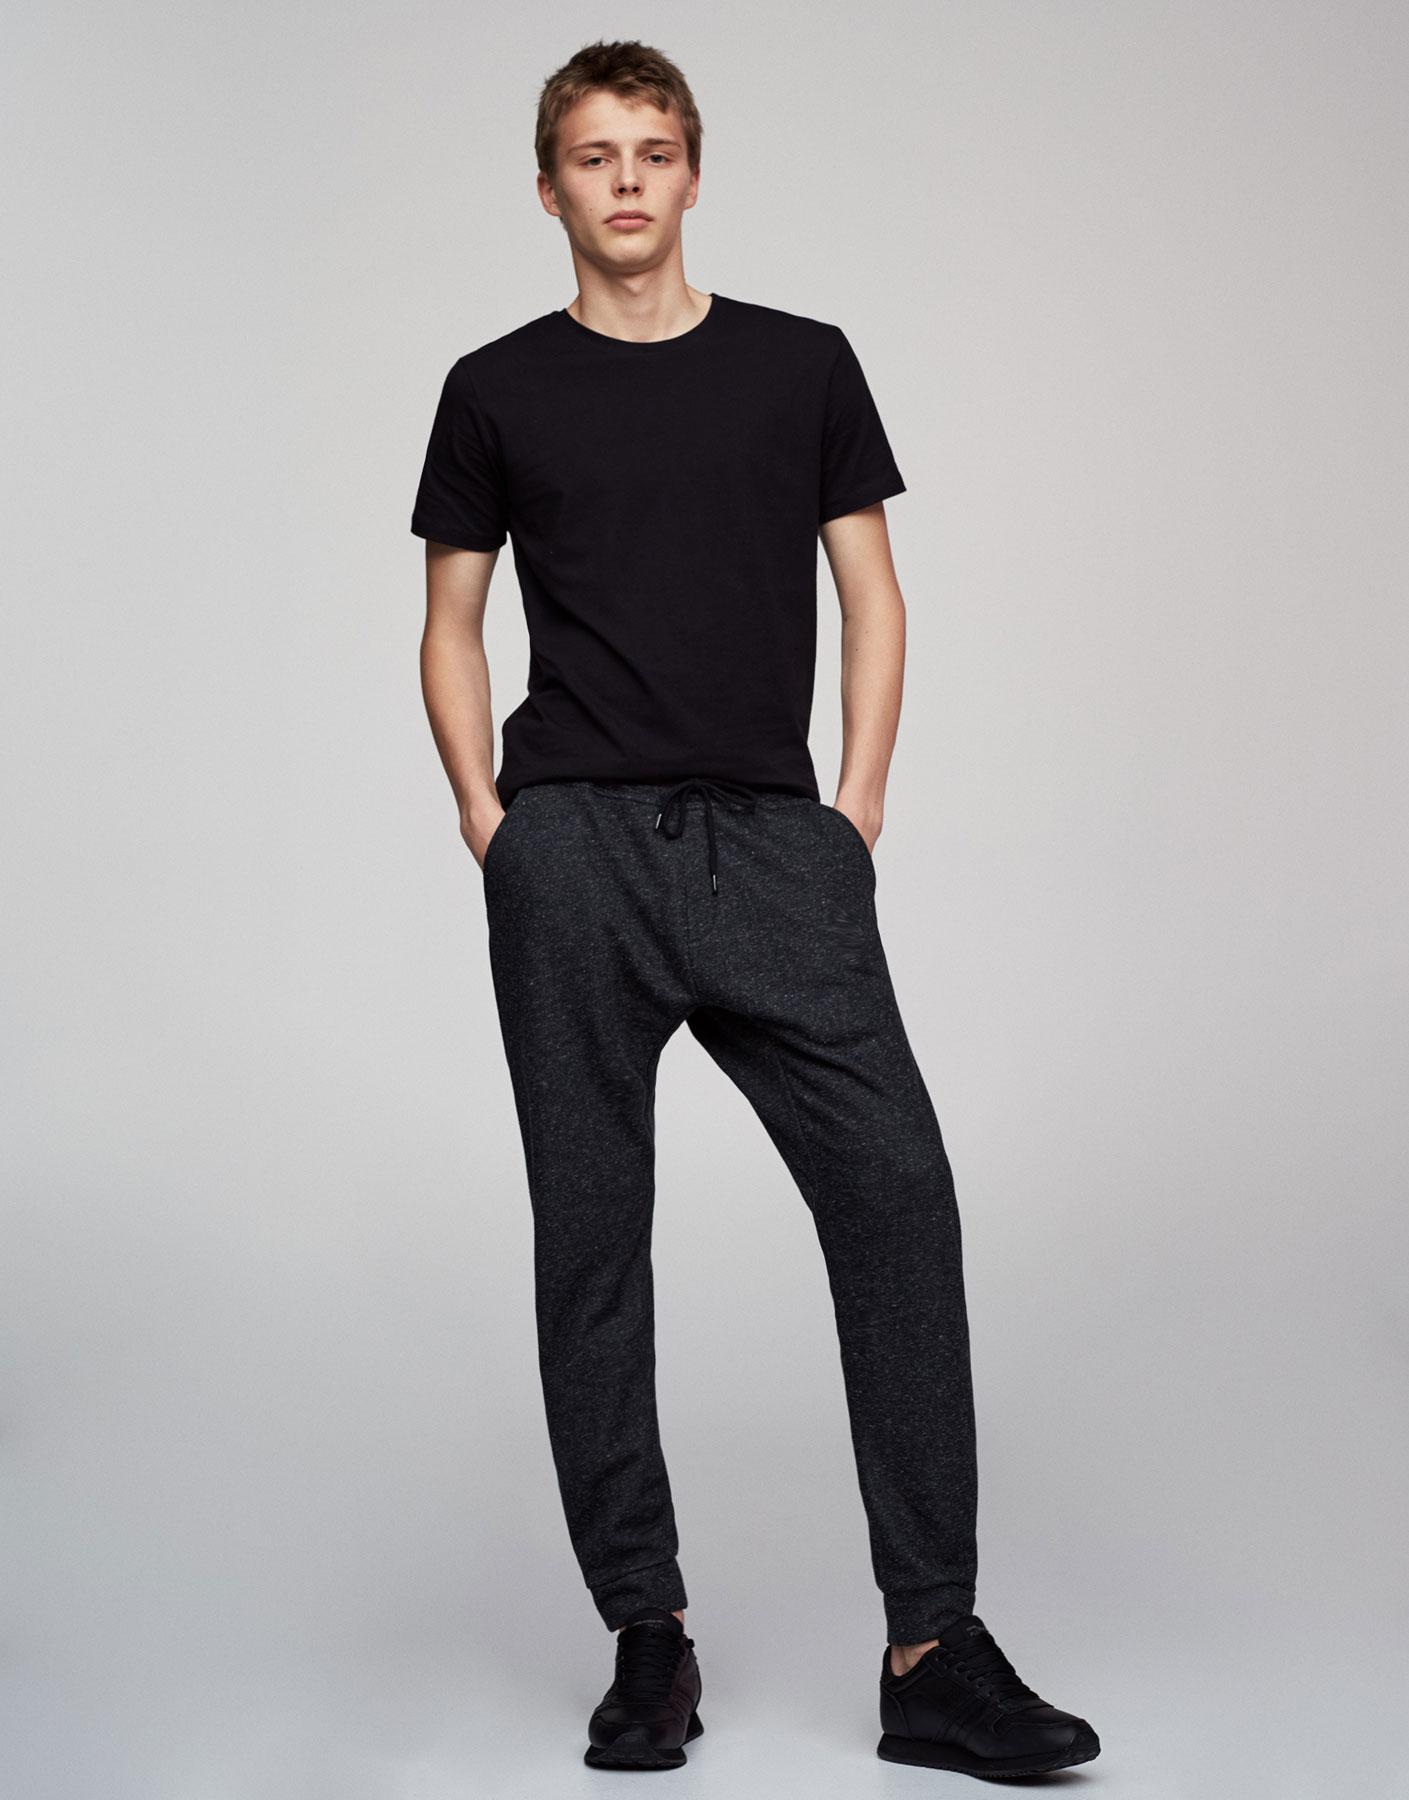 Pantalón jogging baggy negro